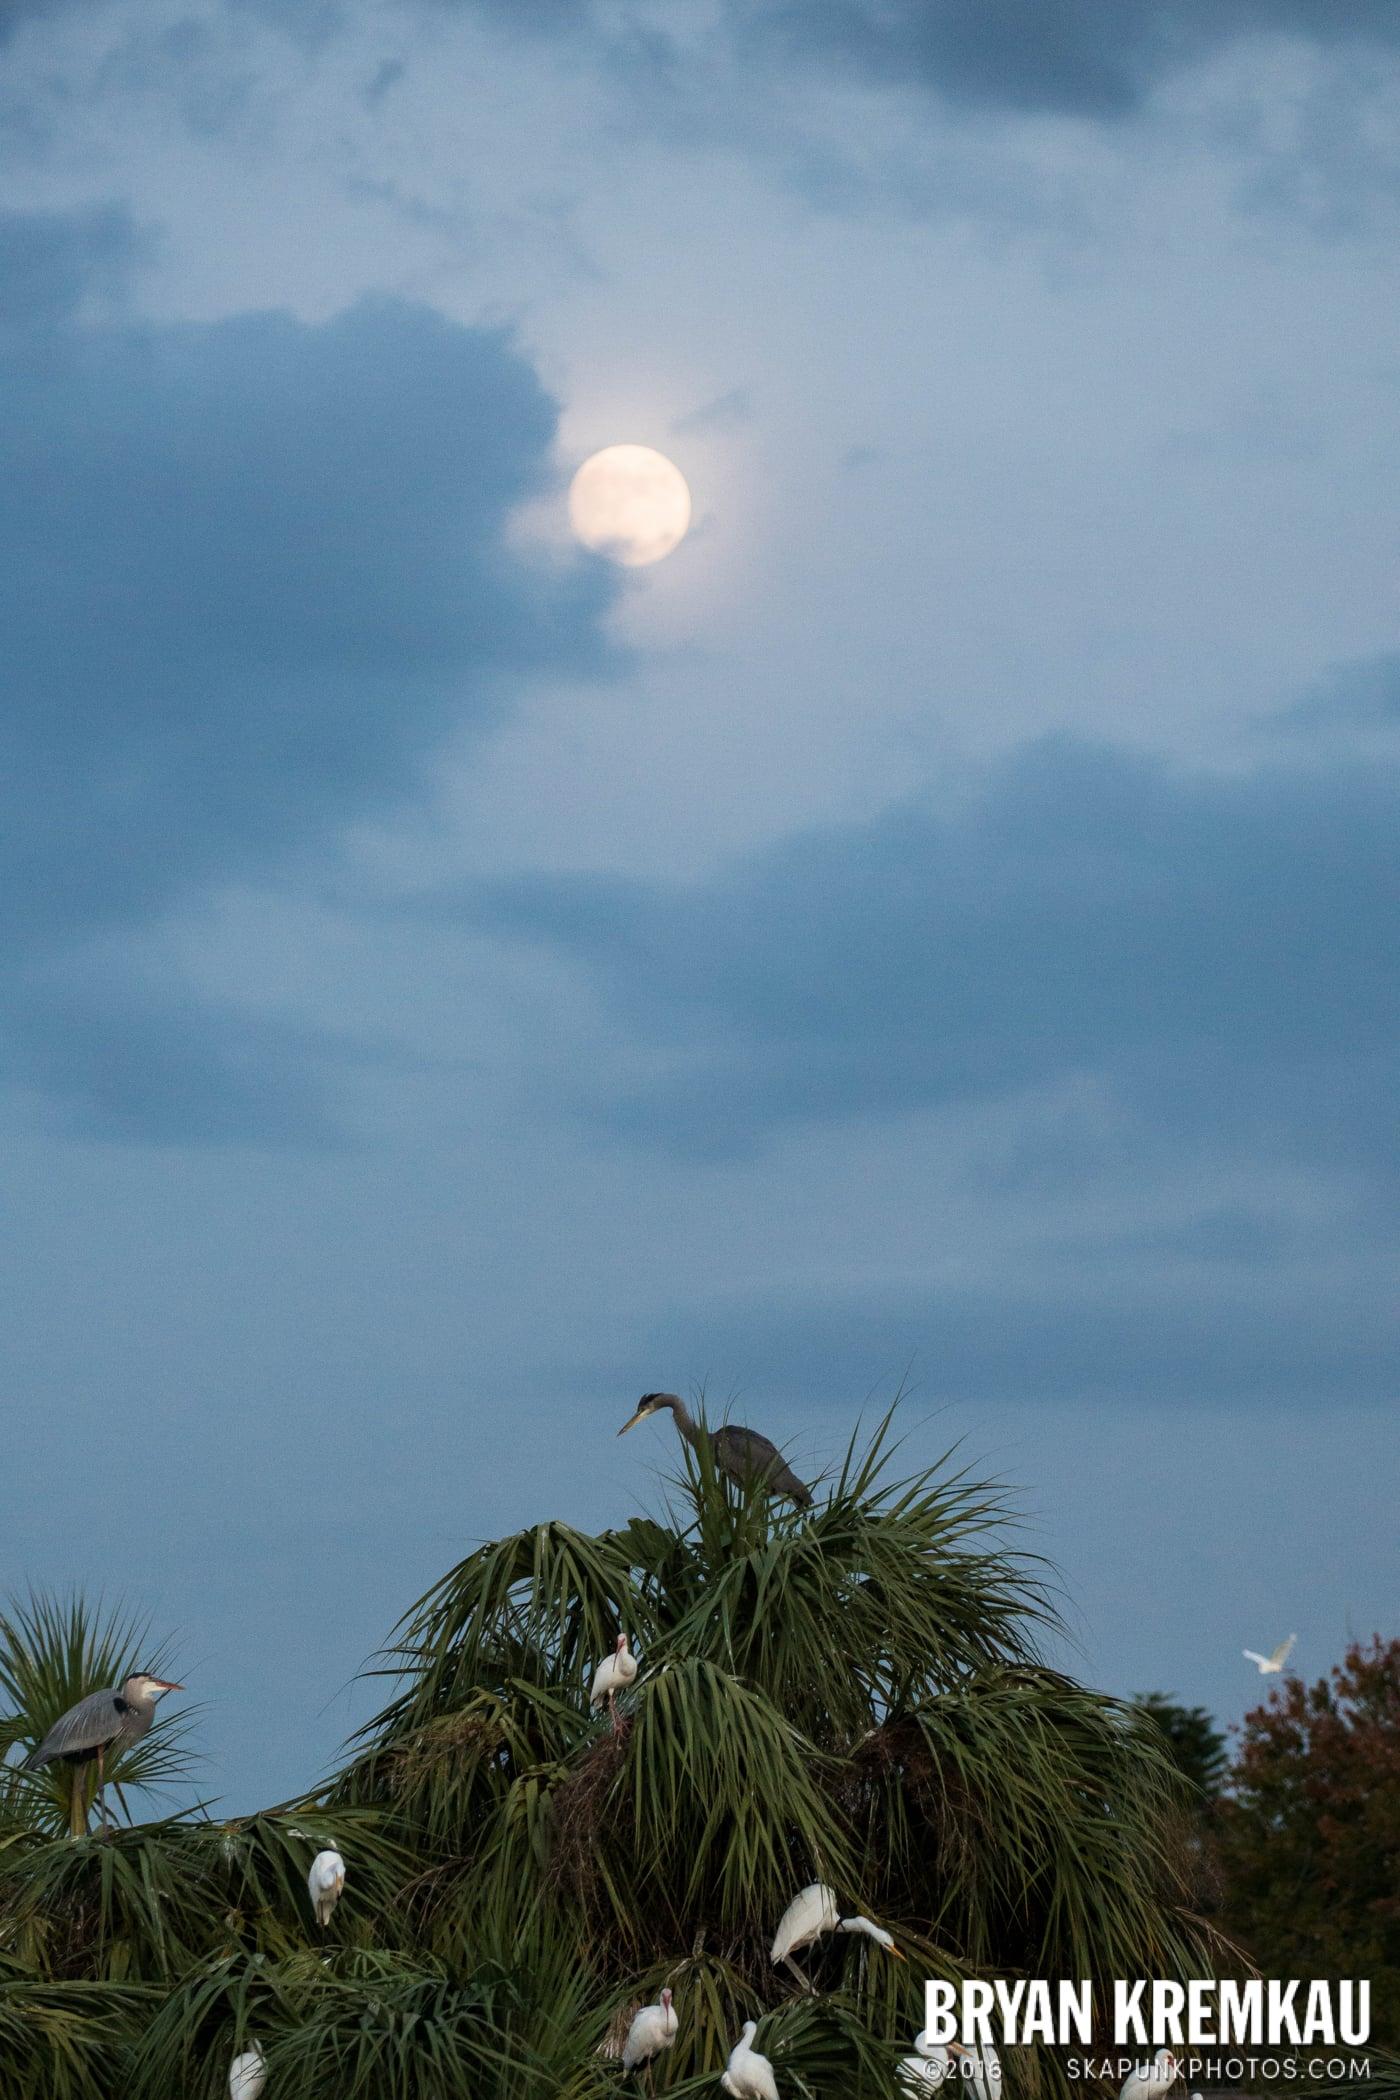 Sunsets, Astrophotography & Birds @ Venice, Florida - 10.25.14 - 11.5.14 (10)